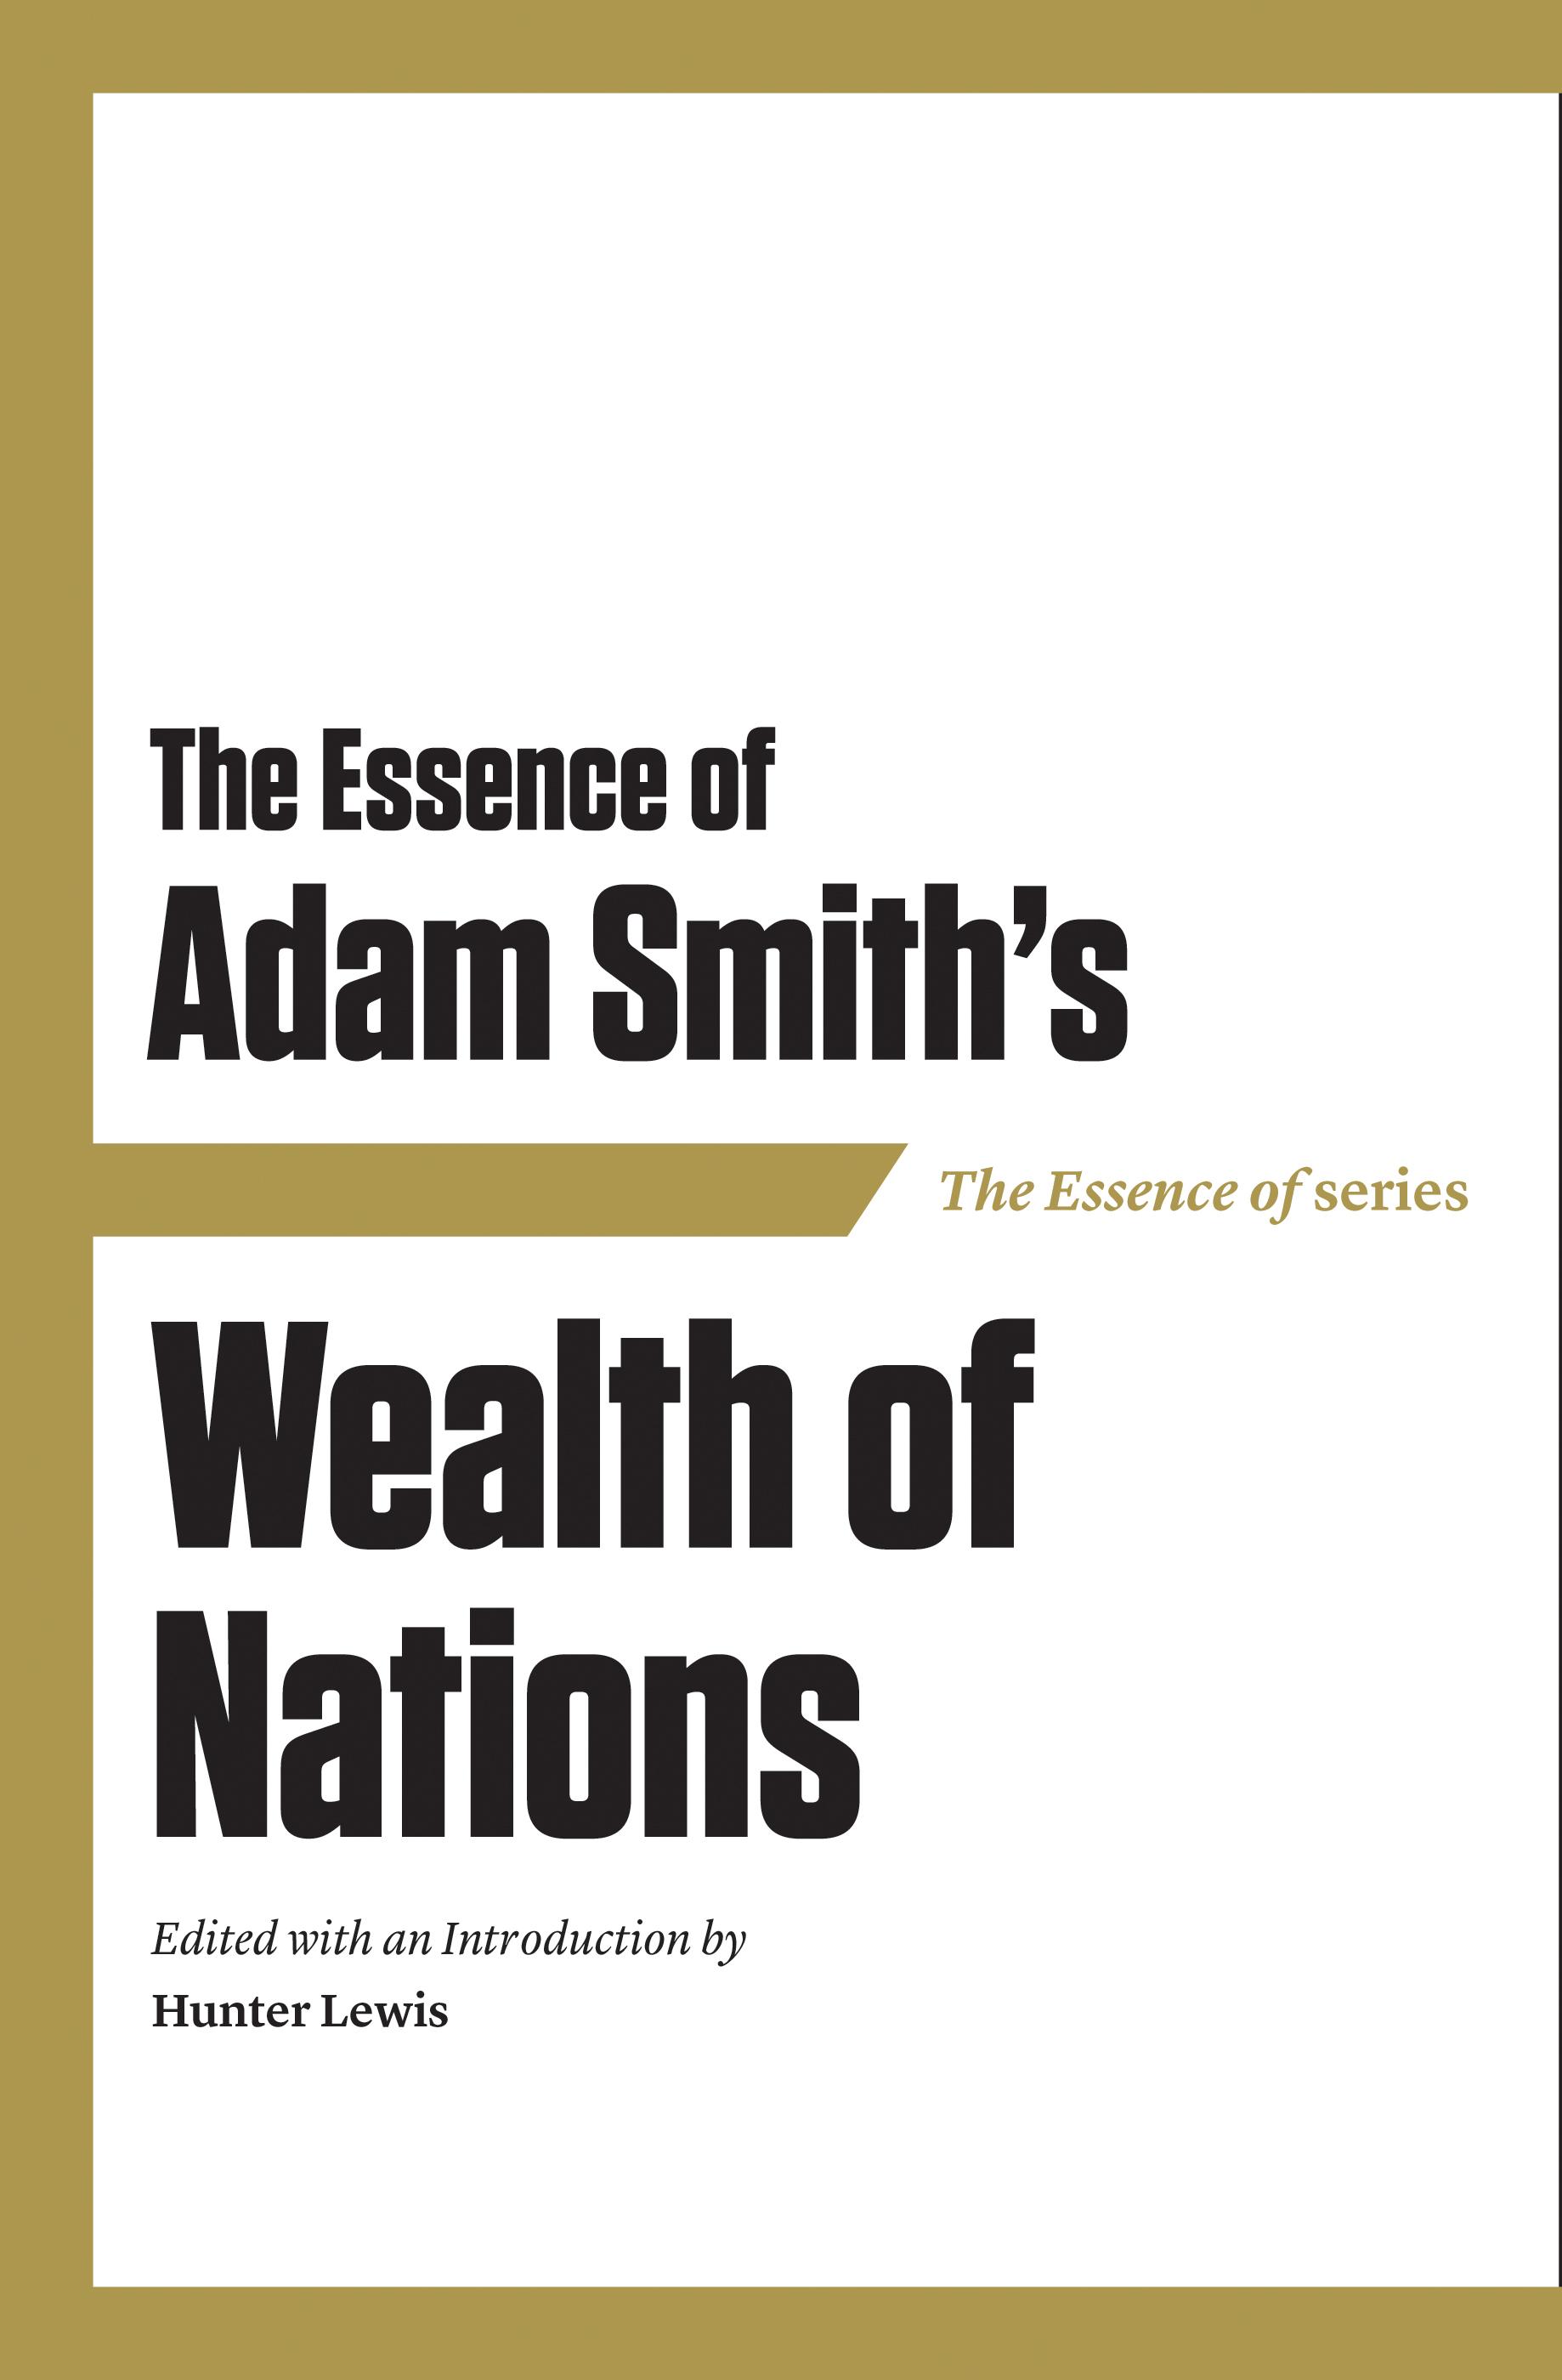 adam smith critique